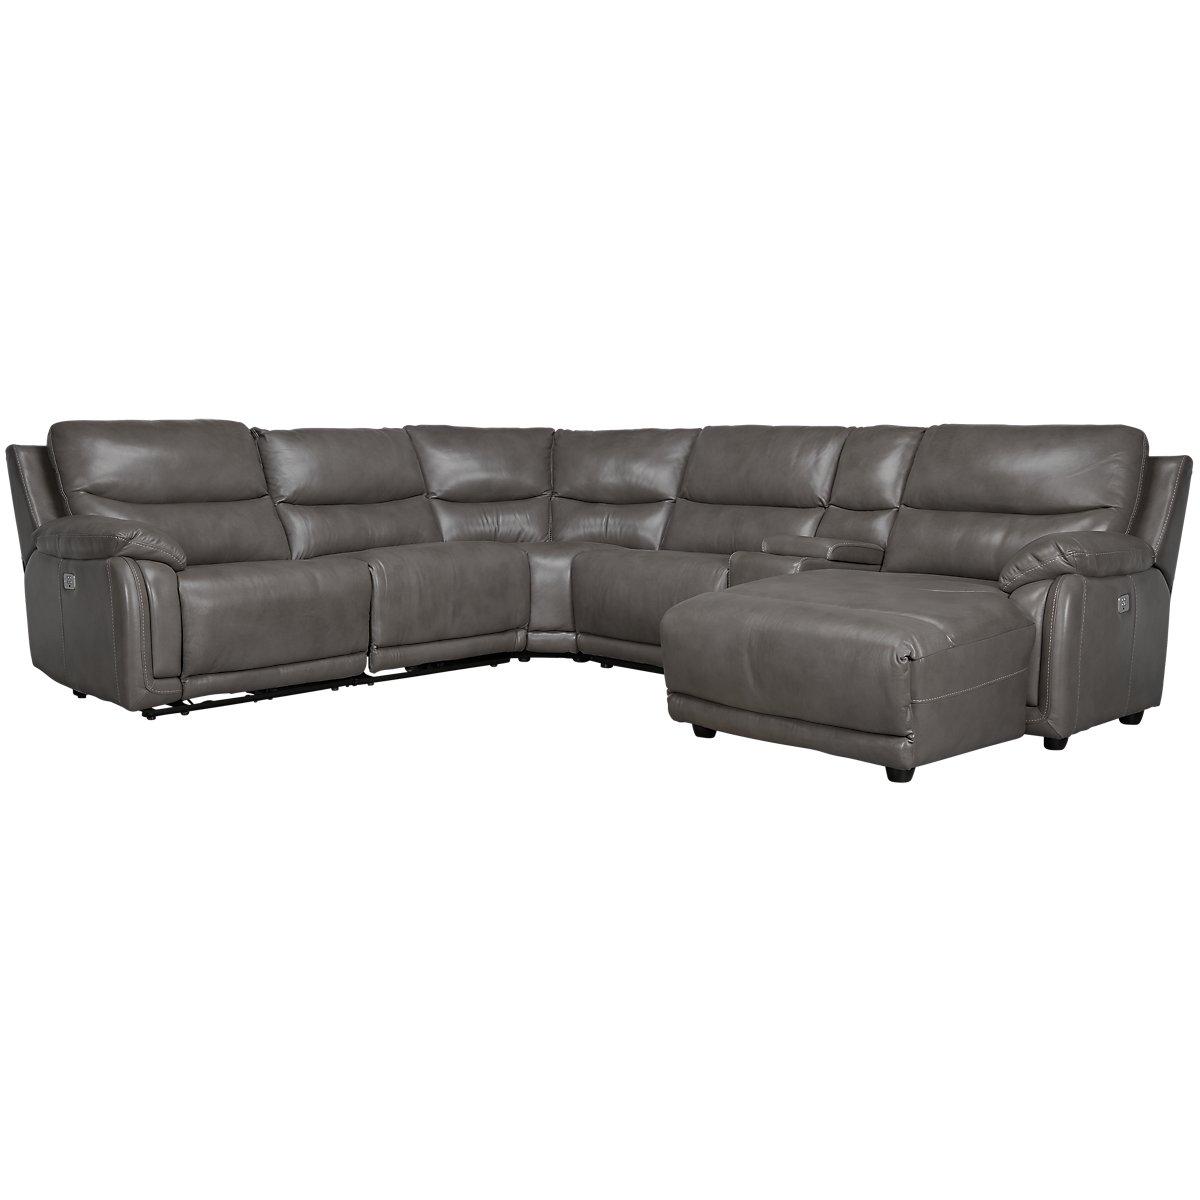 b sofa products sectional creek item corissa vinyl and number palliser seat stoney love